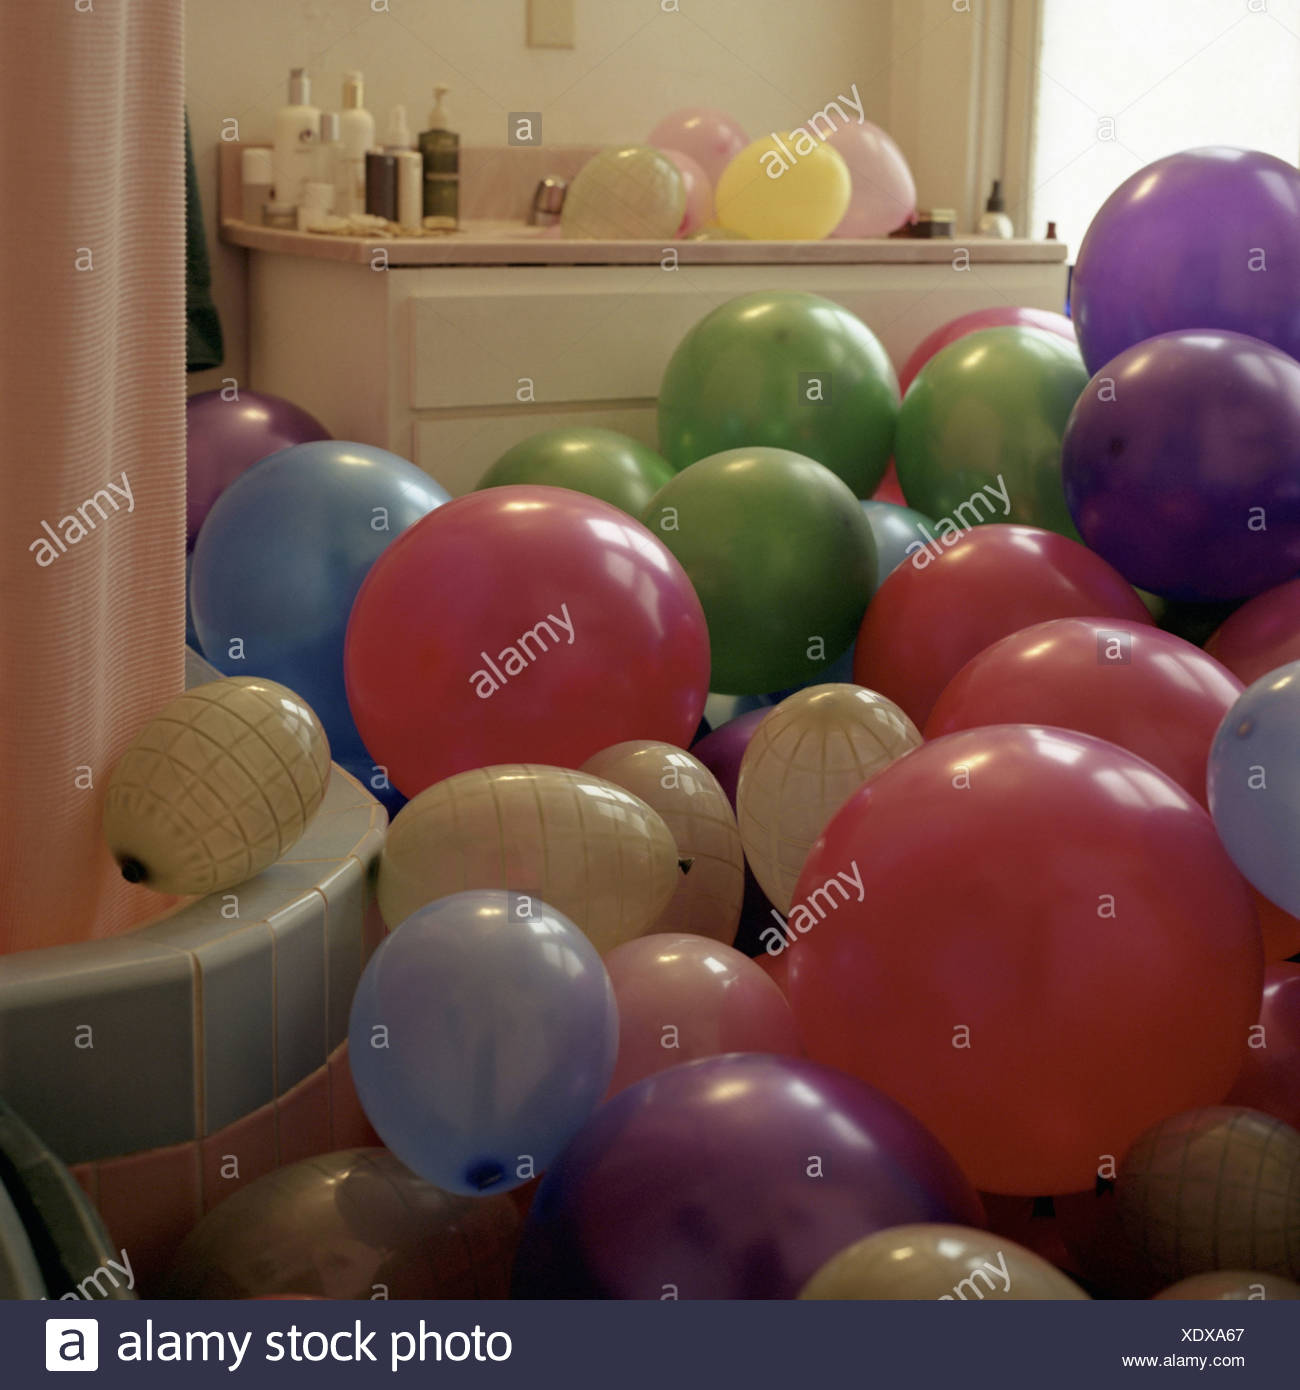 Bathroom balloons prank joke humor overfills cleverly surprise wedding wedding-prank bath balloons inflated colorfully indoors - Stock Image